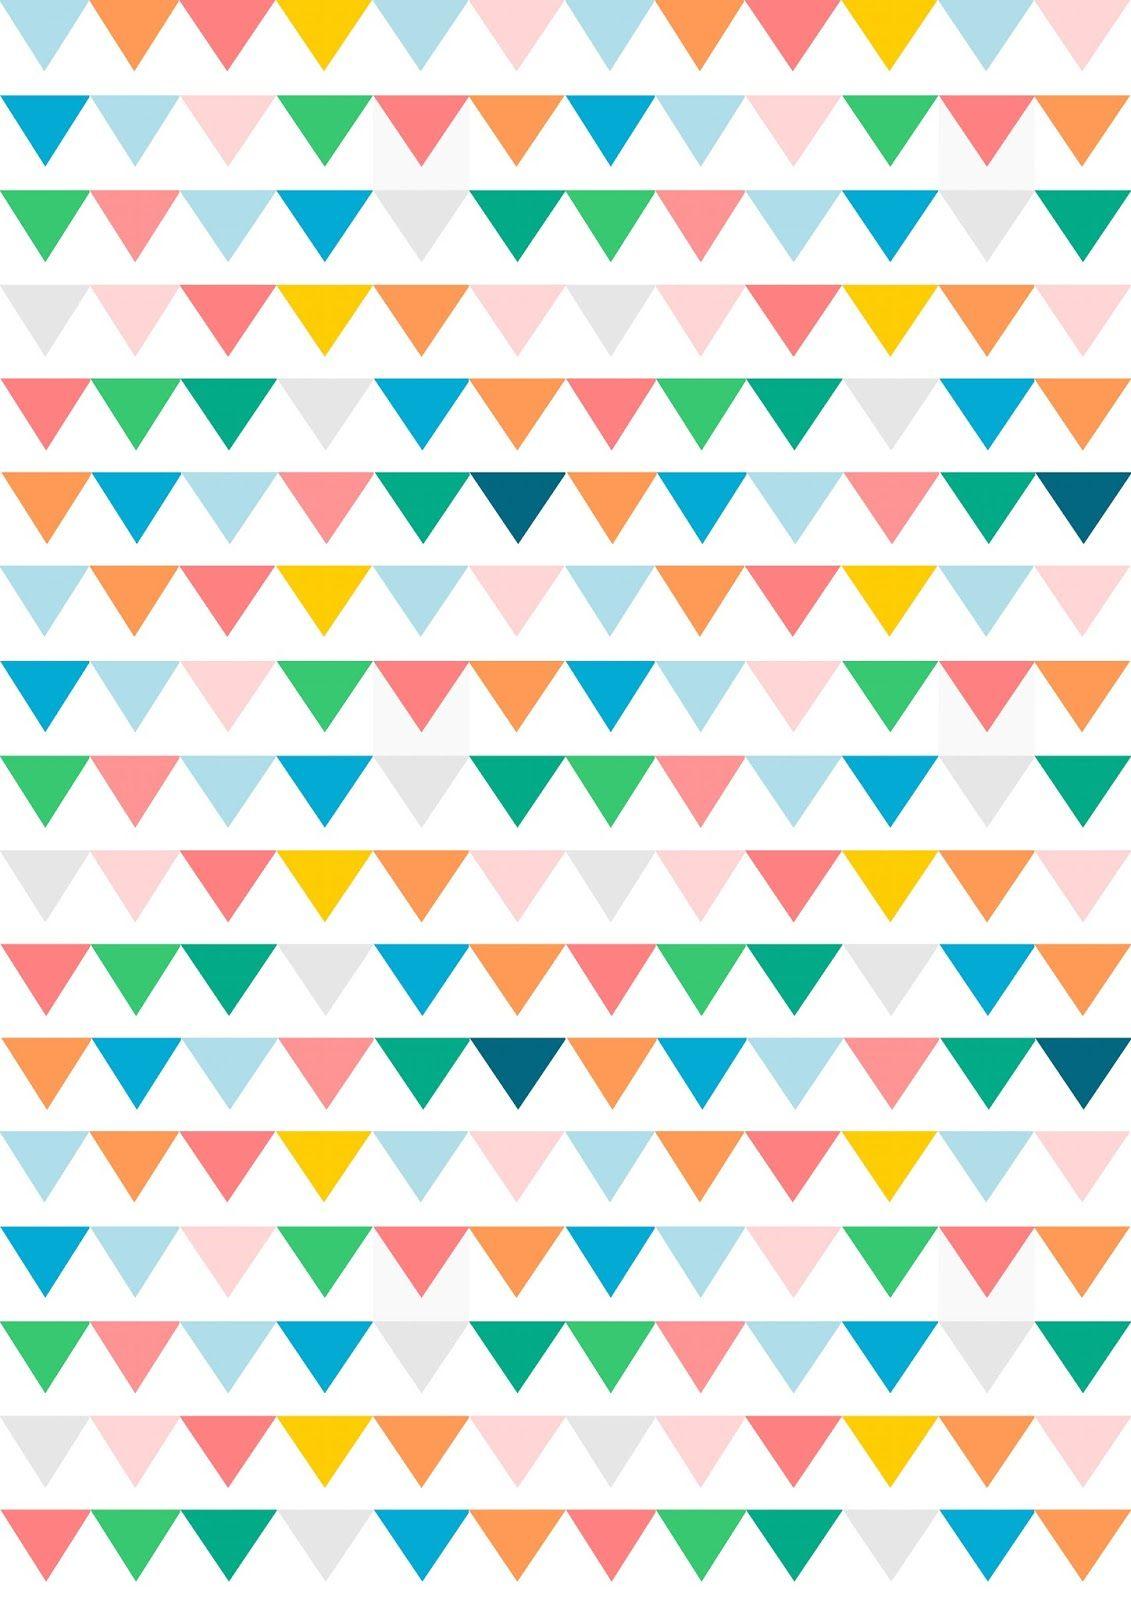 Free Printable Scrapbook Sheets - 8.3.hinterhaus-Hemau.de • - Free Printable Pattern Paper Sheets